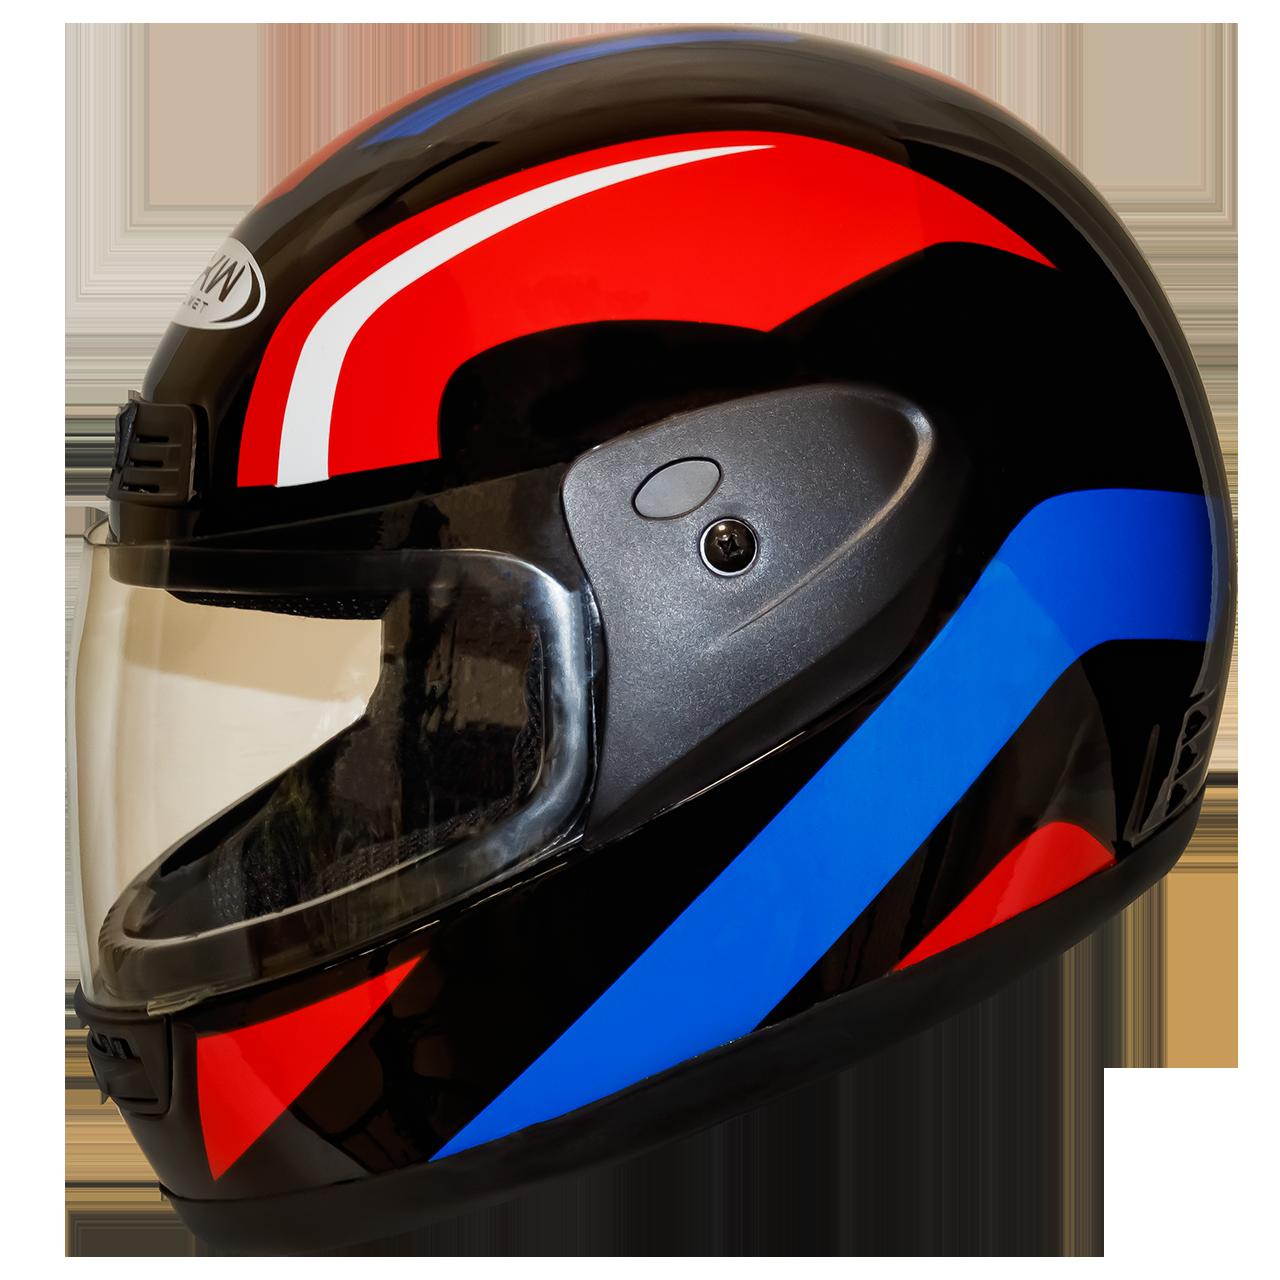 Мотошлем FXW HF-109 solid black-red-blue закрытый шлем интеграл, full-face чёрно-красно-синий глянцевый